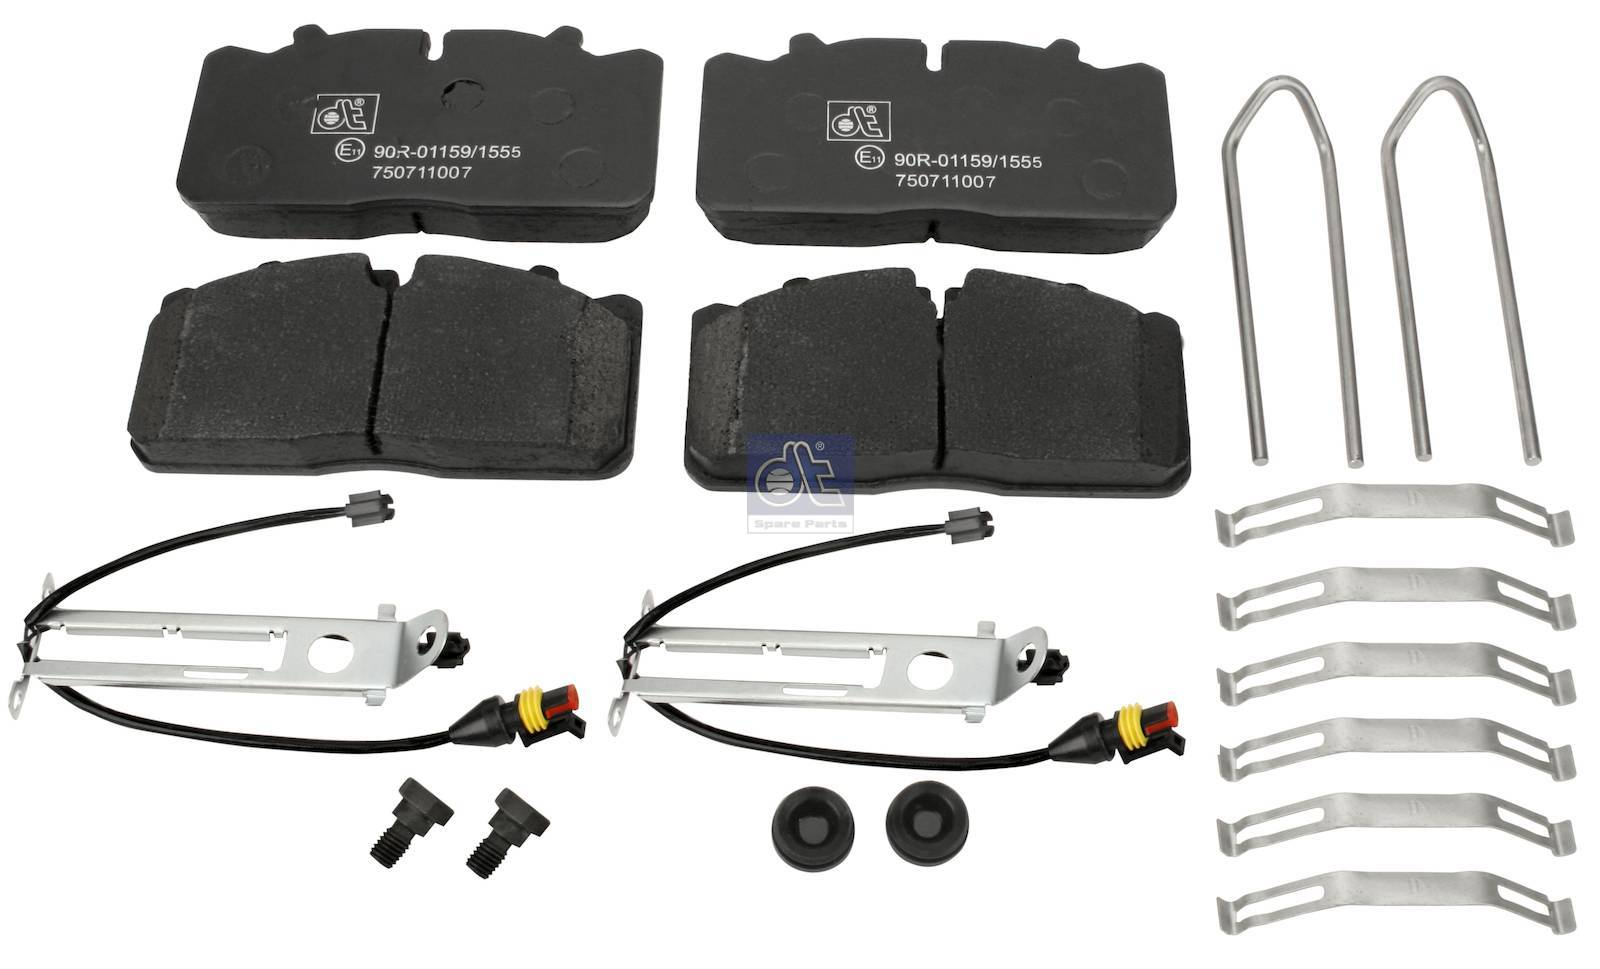 Disc brake pad kit, with wear indicators